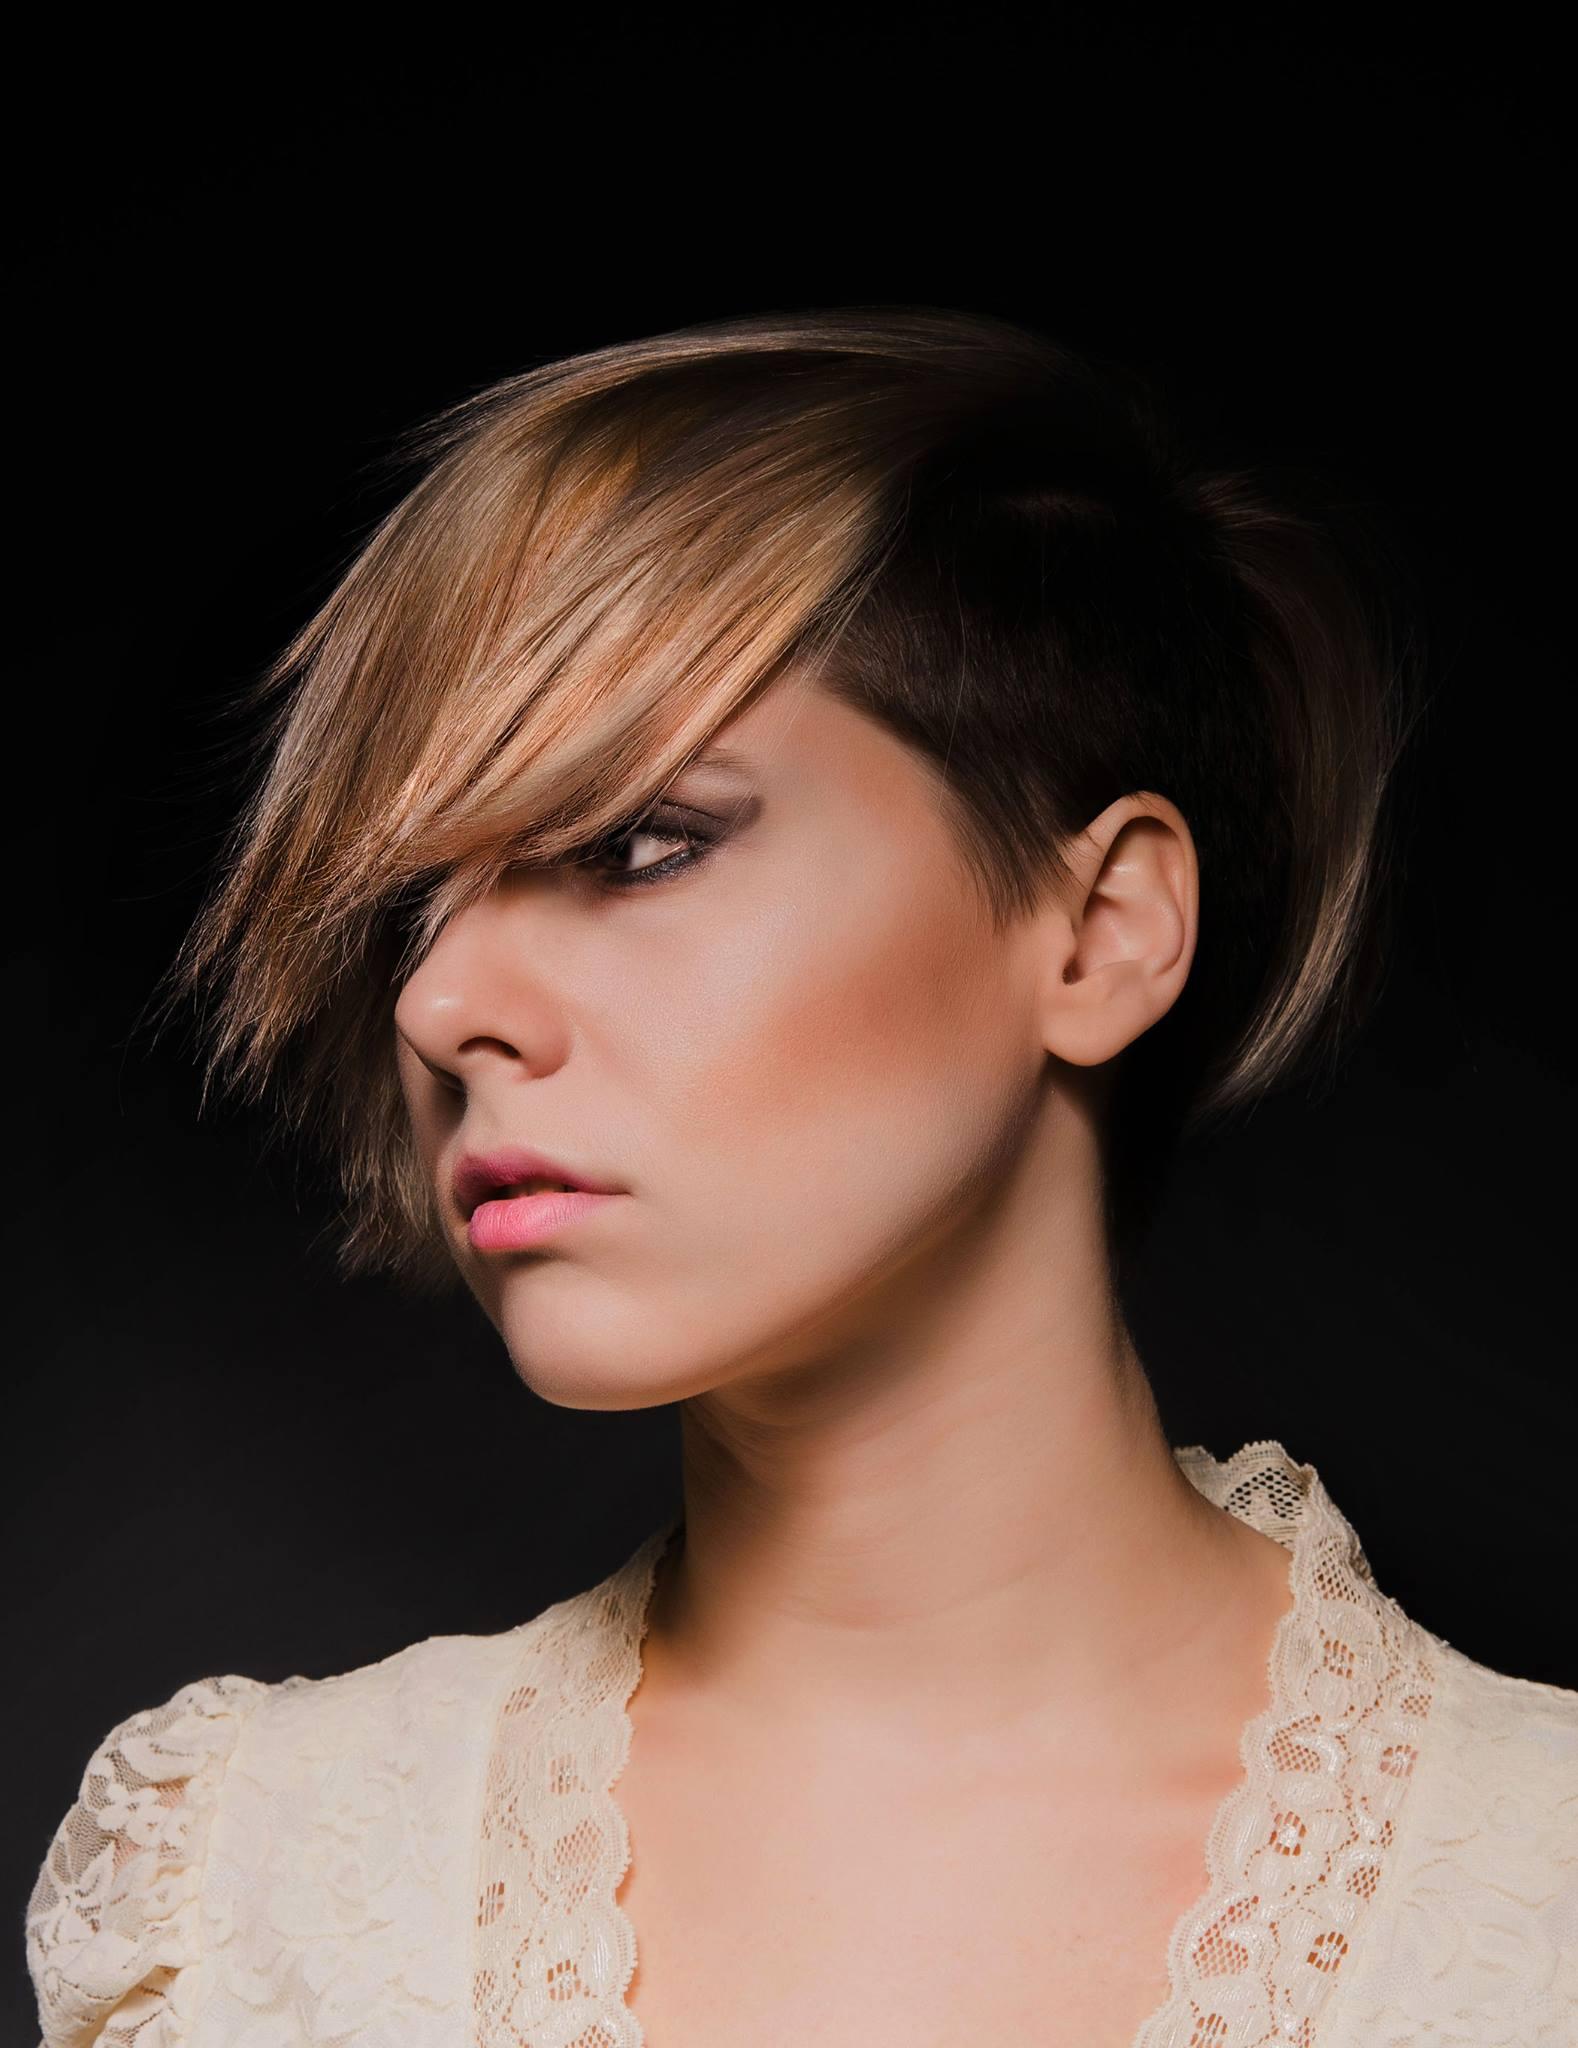 création D'alberto haute coiffure